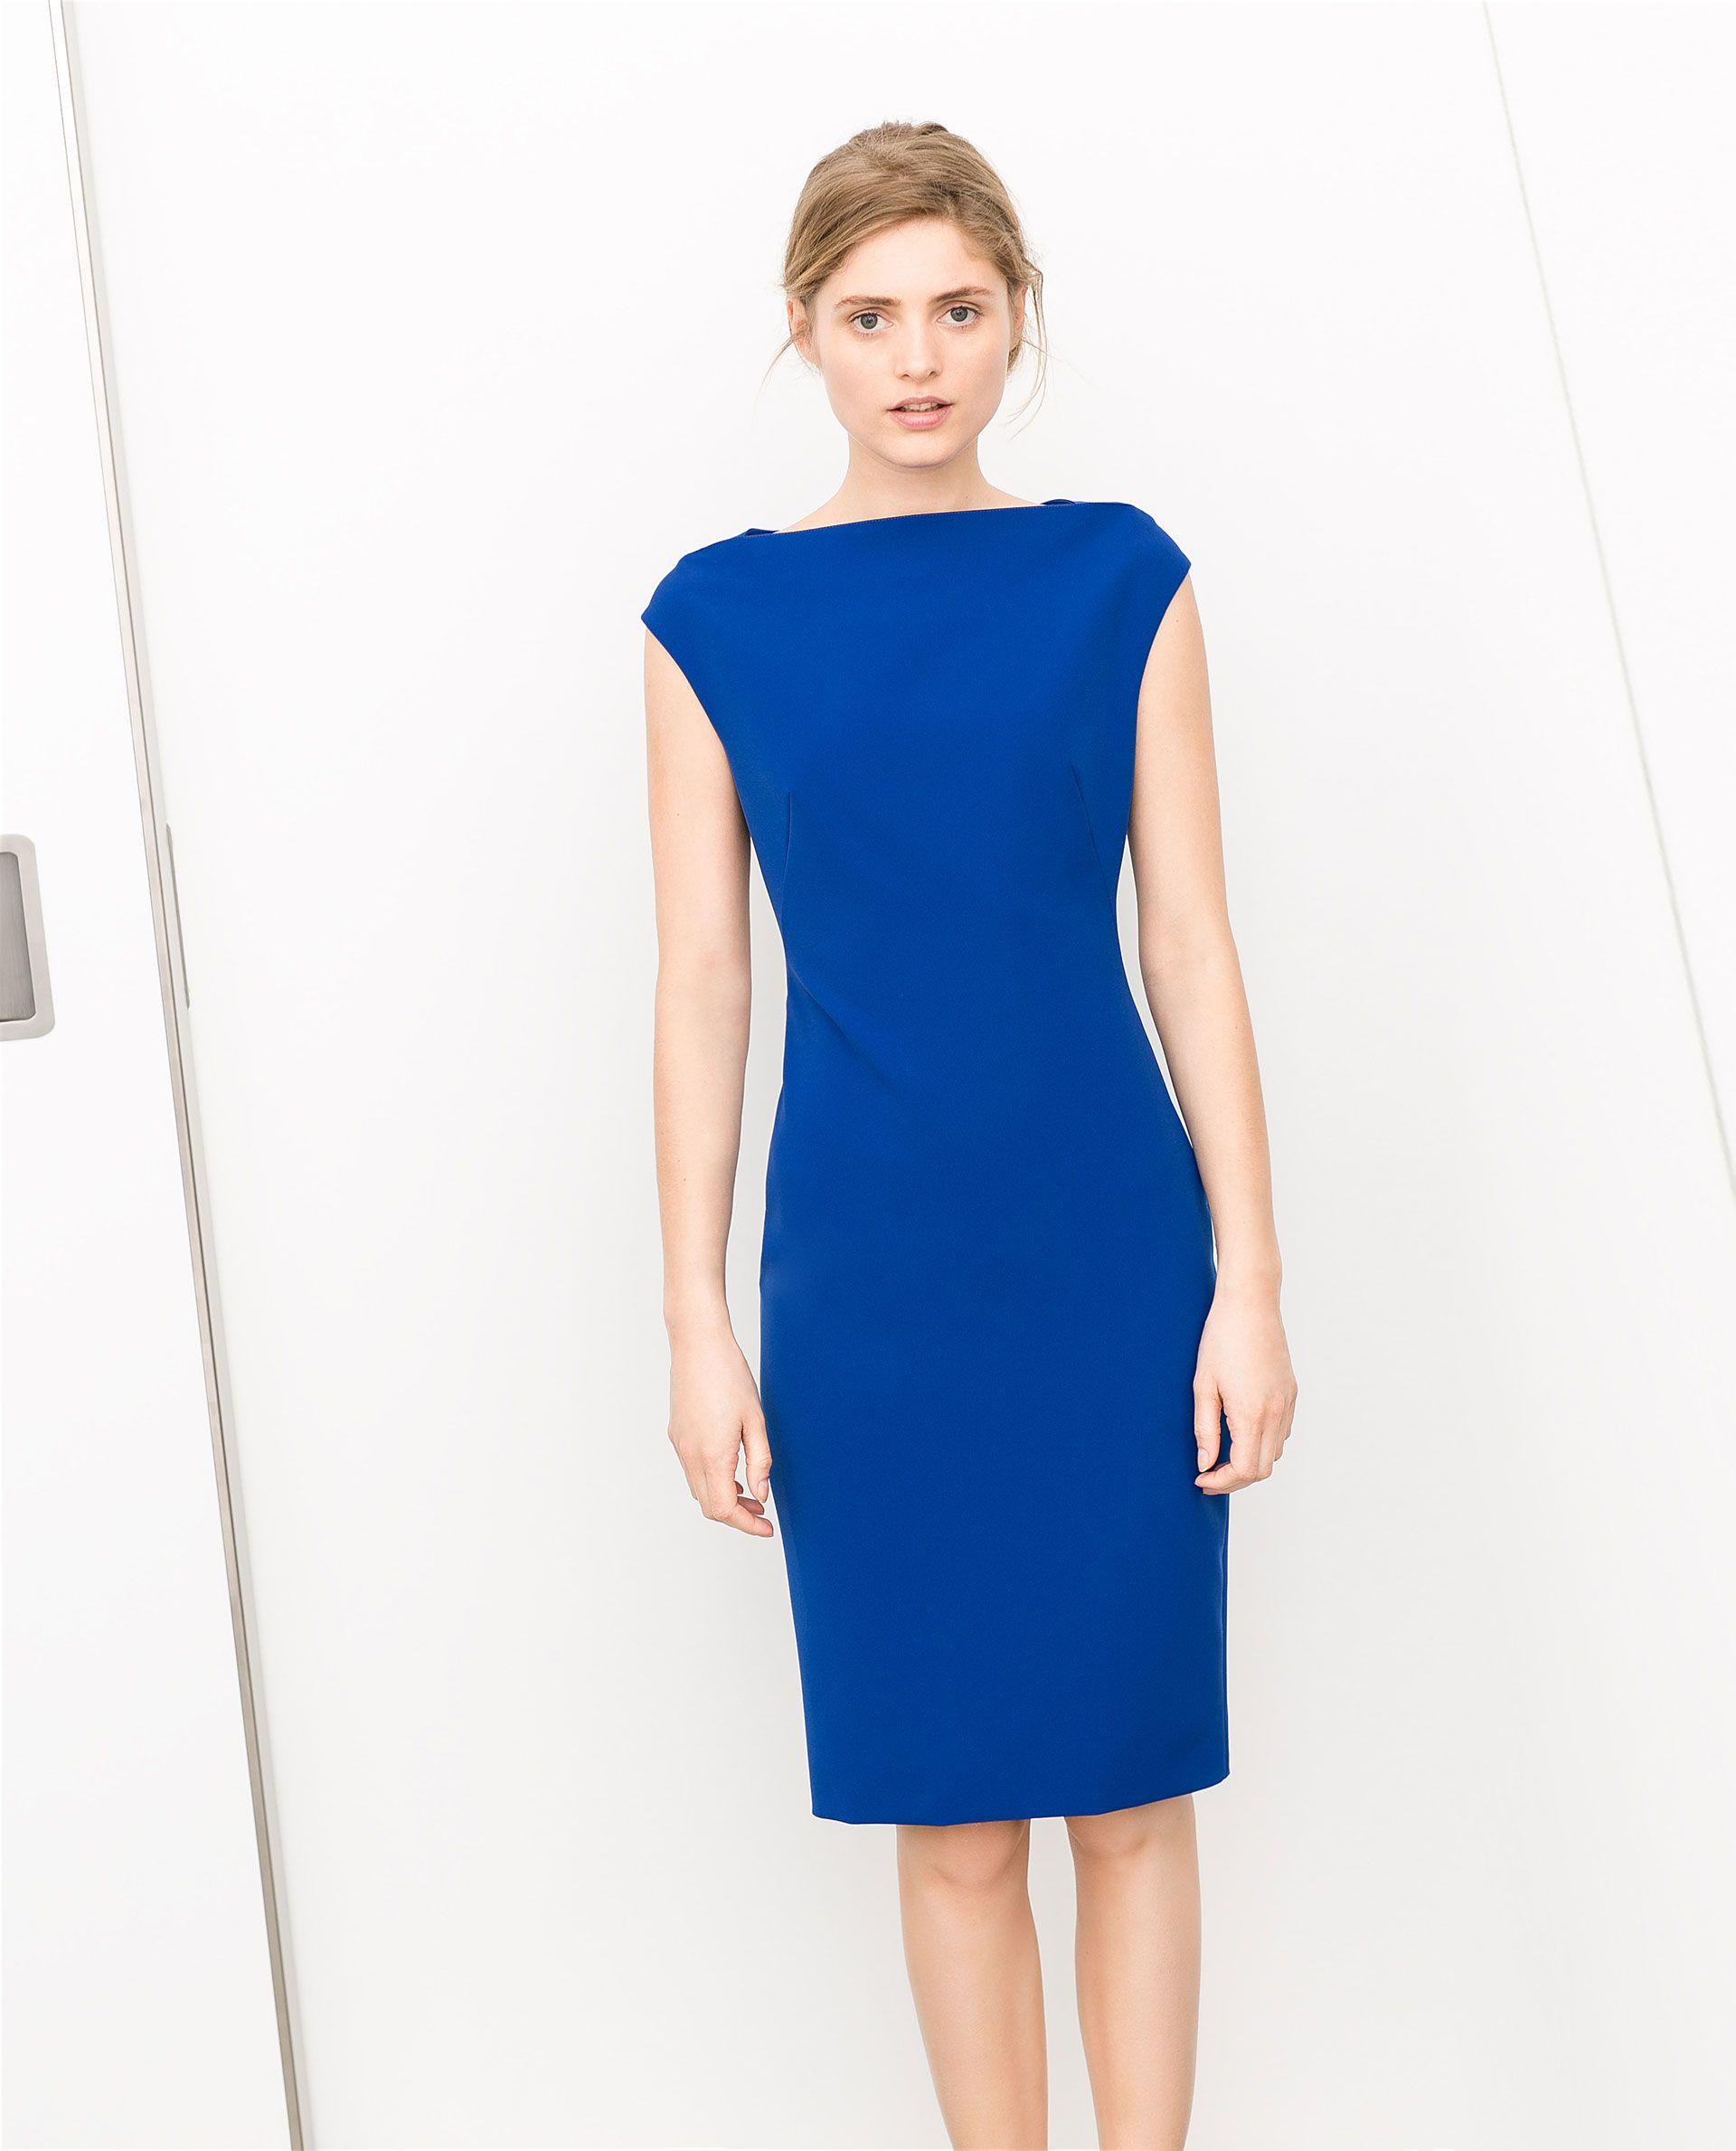 Blue dress zara clothing wedding dress pinterest blue dresses blue dress zara clothing ombrellifo Image collections